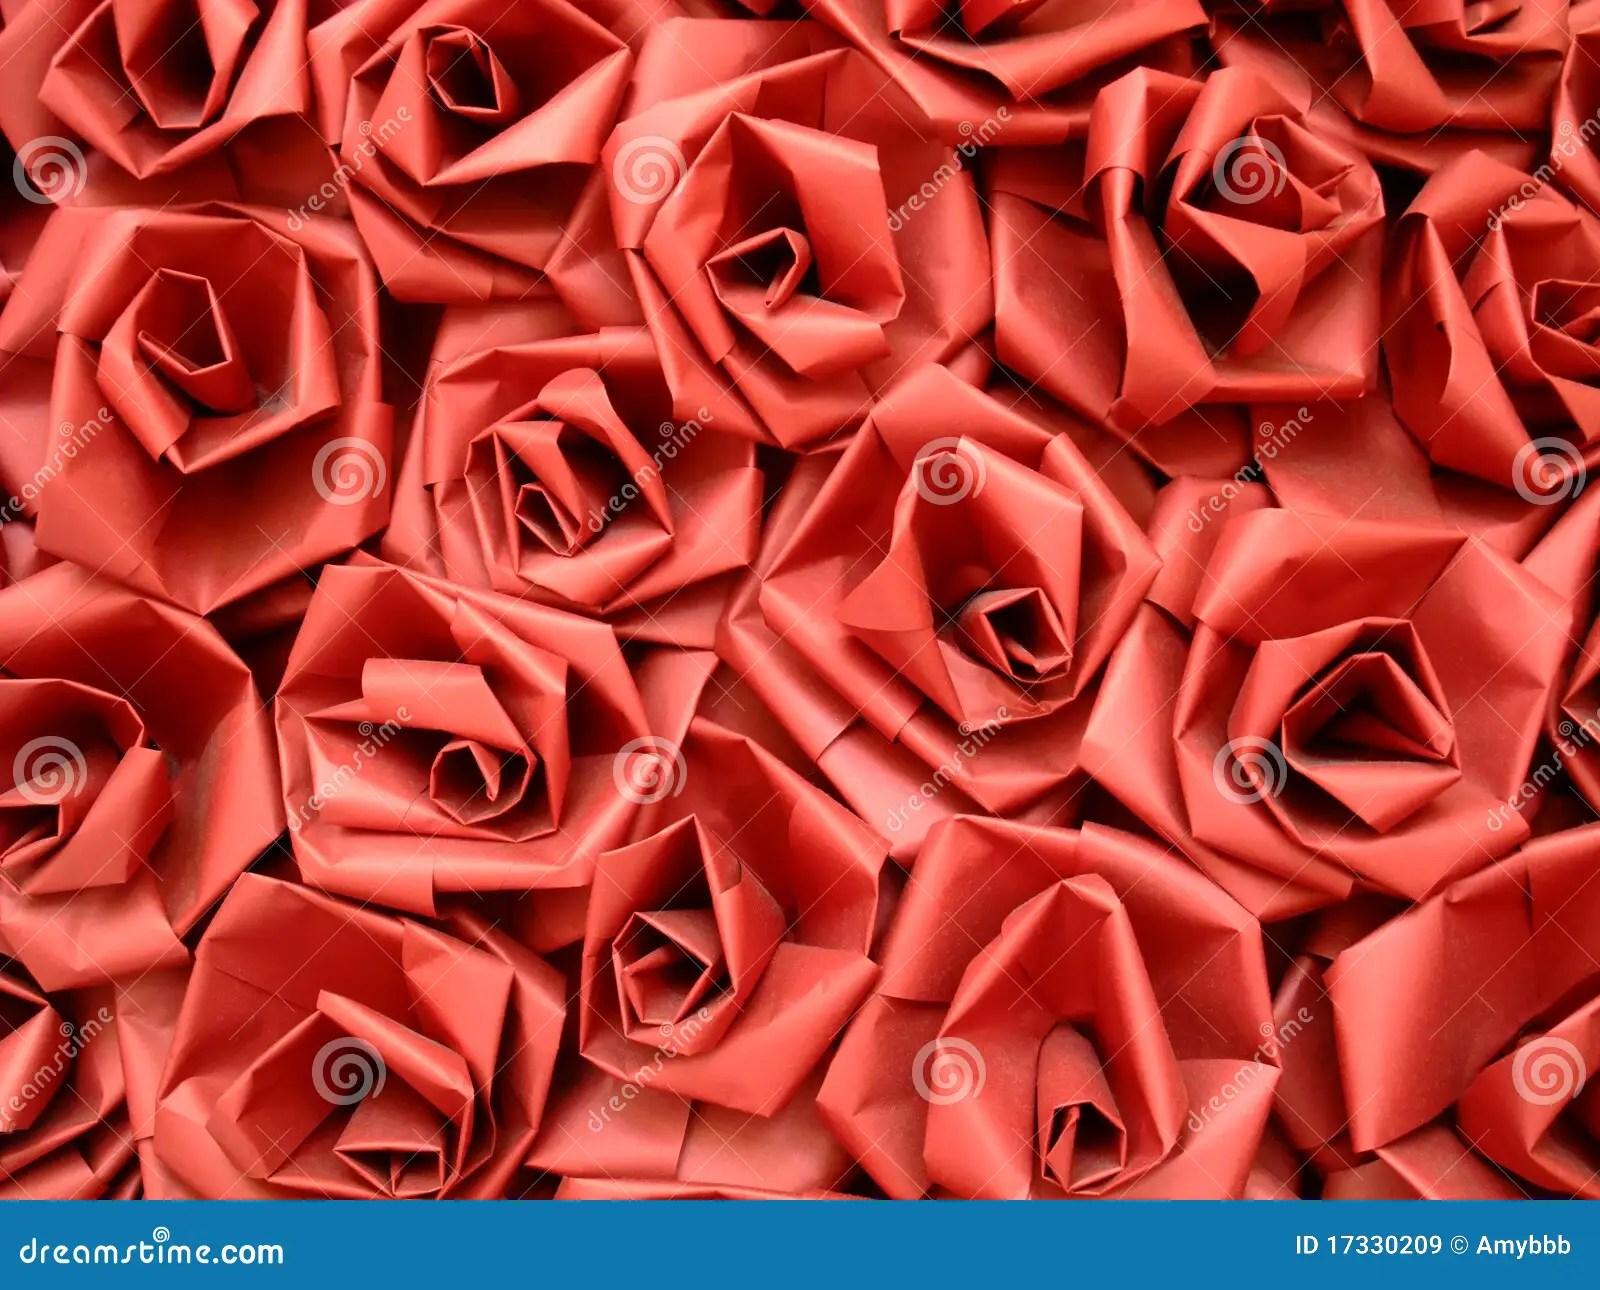 I Love U Rose Wallpaper